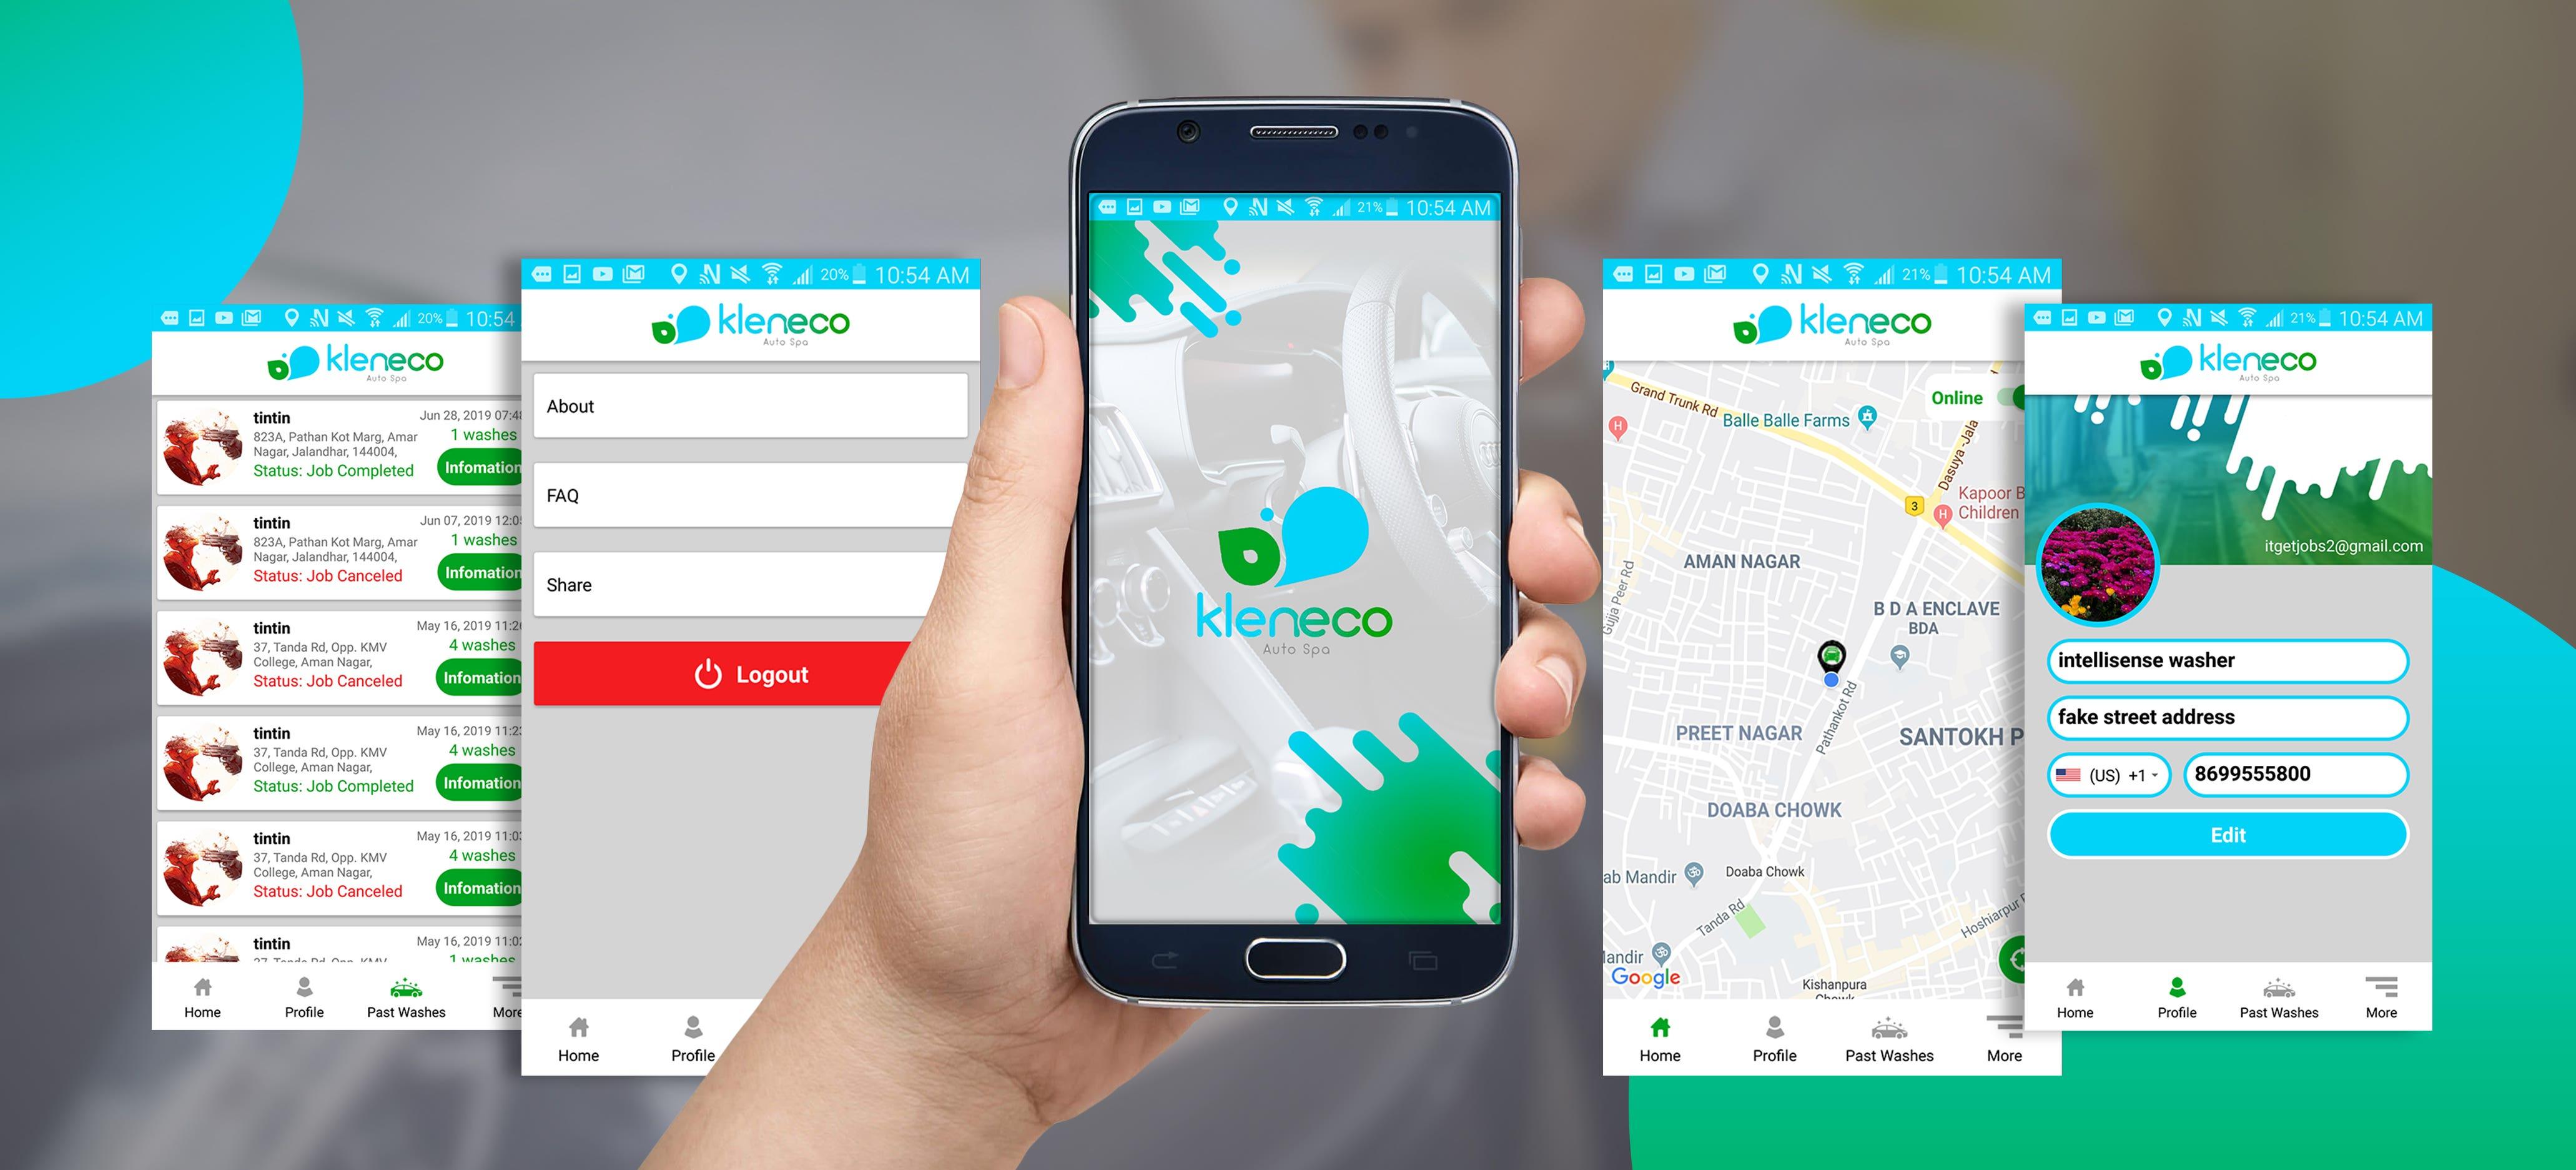 Kleneco - Uber for Car Washing